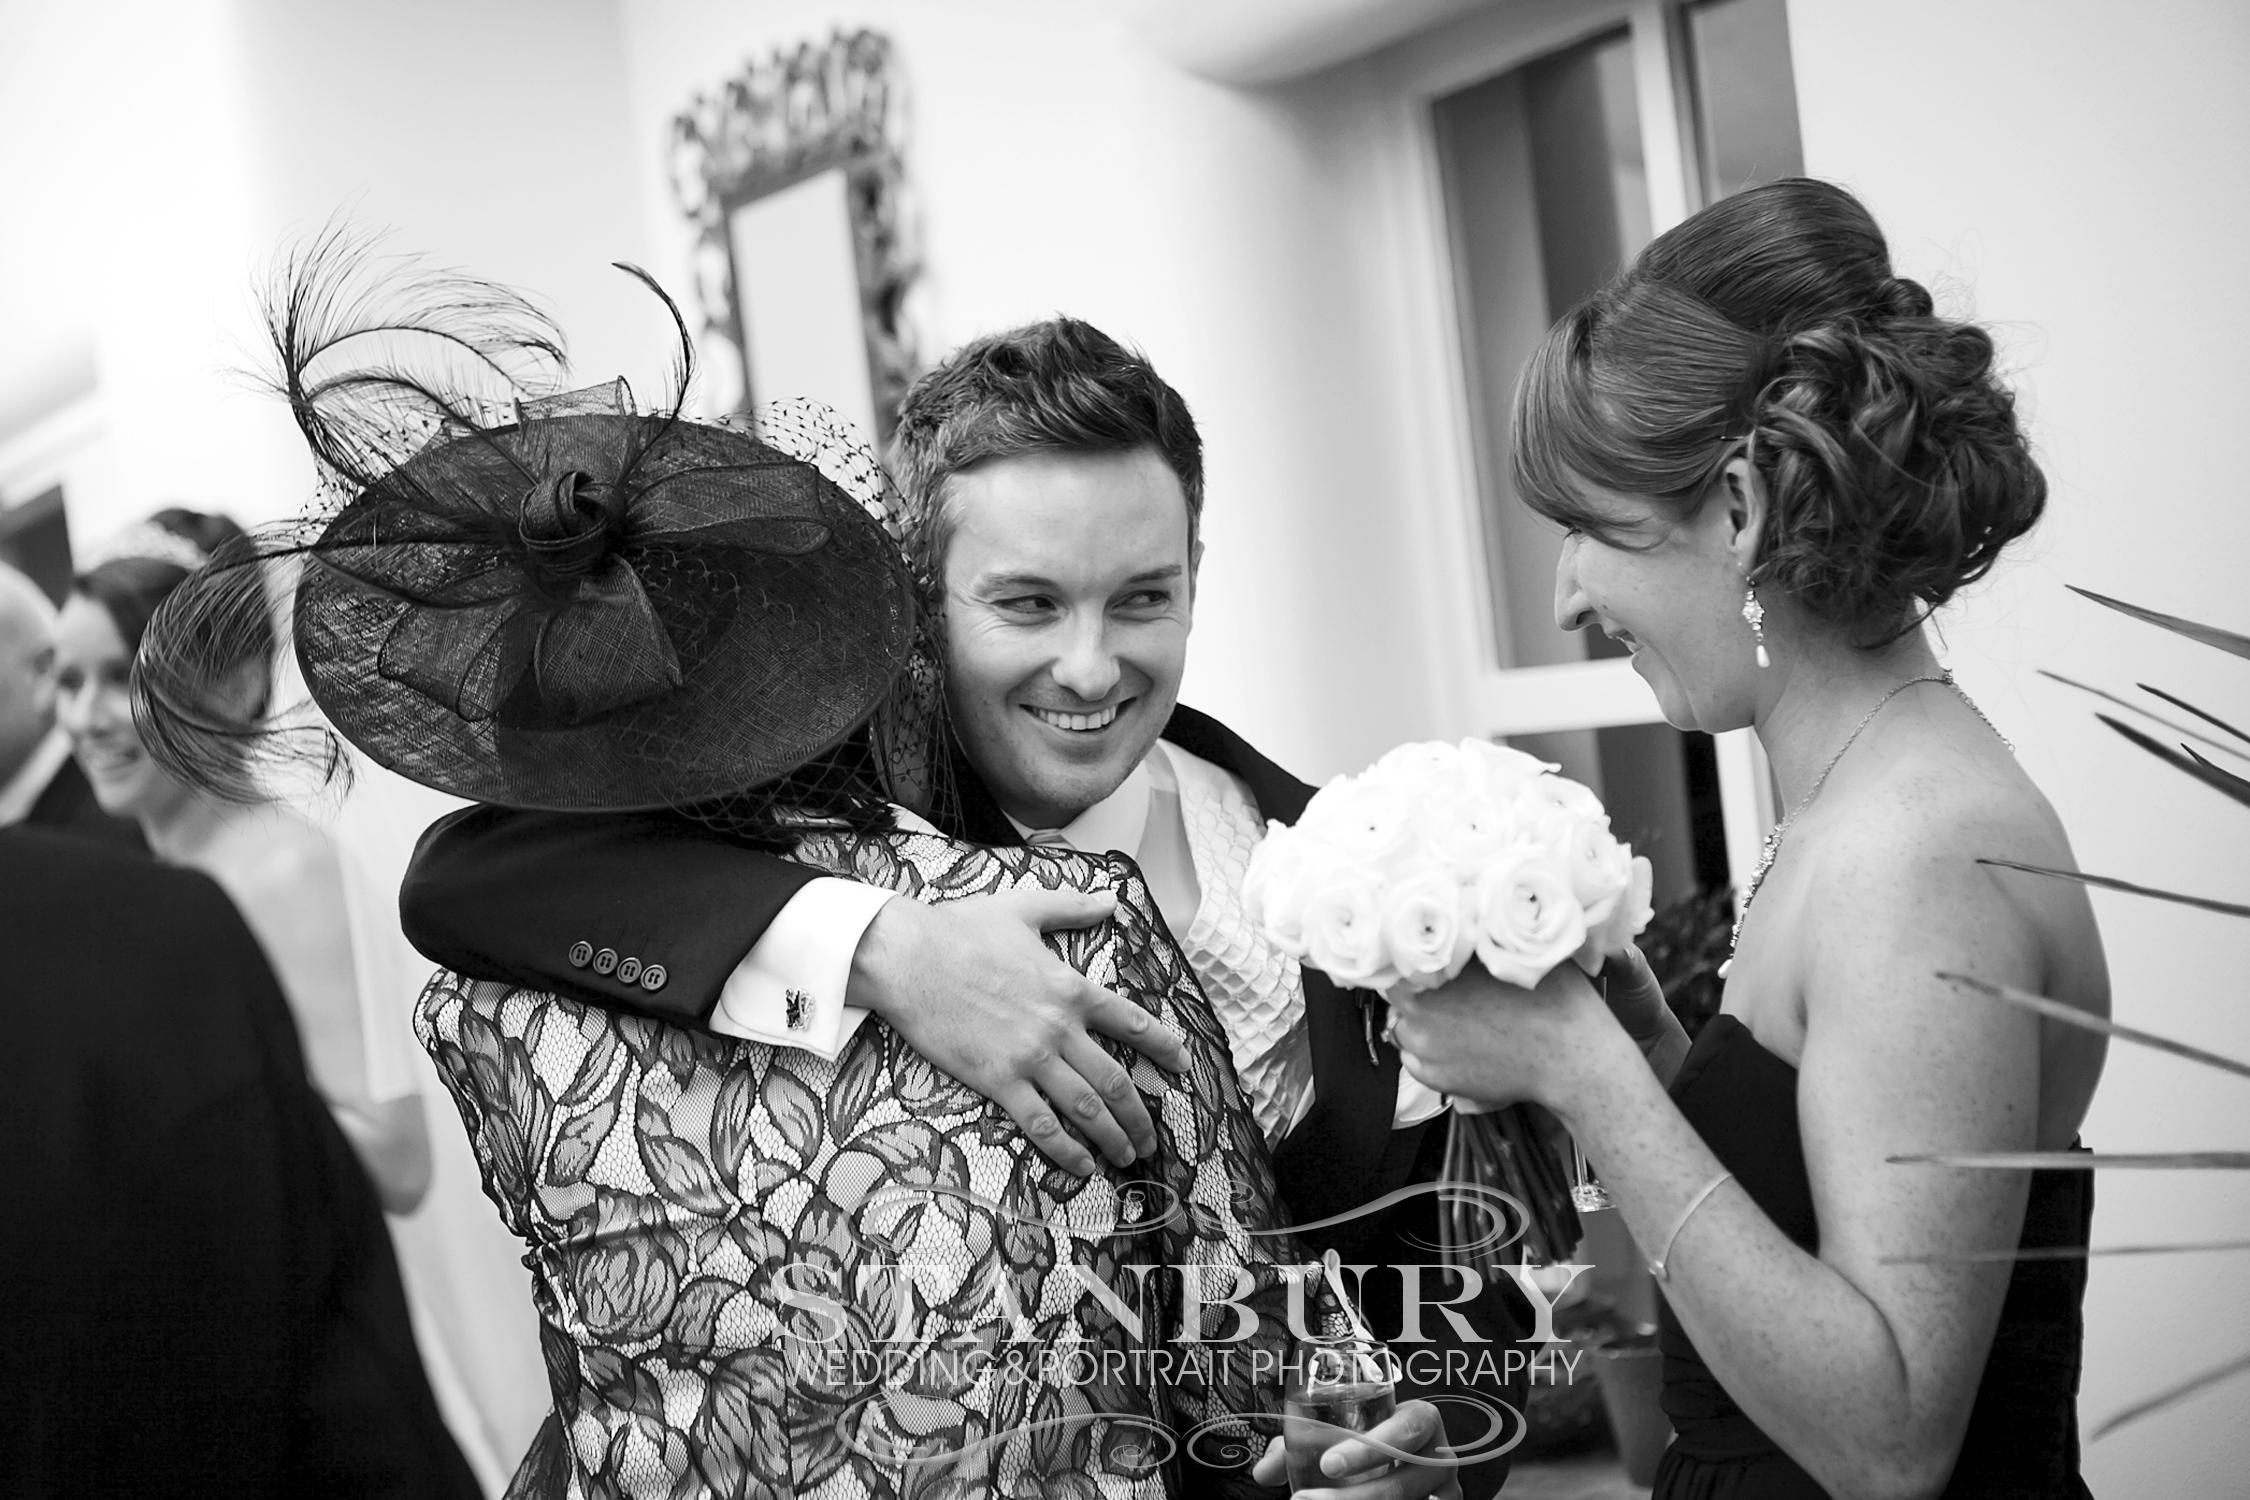 wedding photography at mitton hall by stanbury studio.com